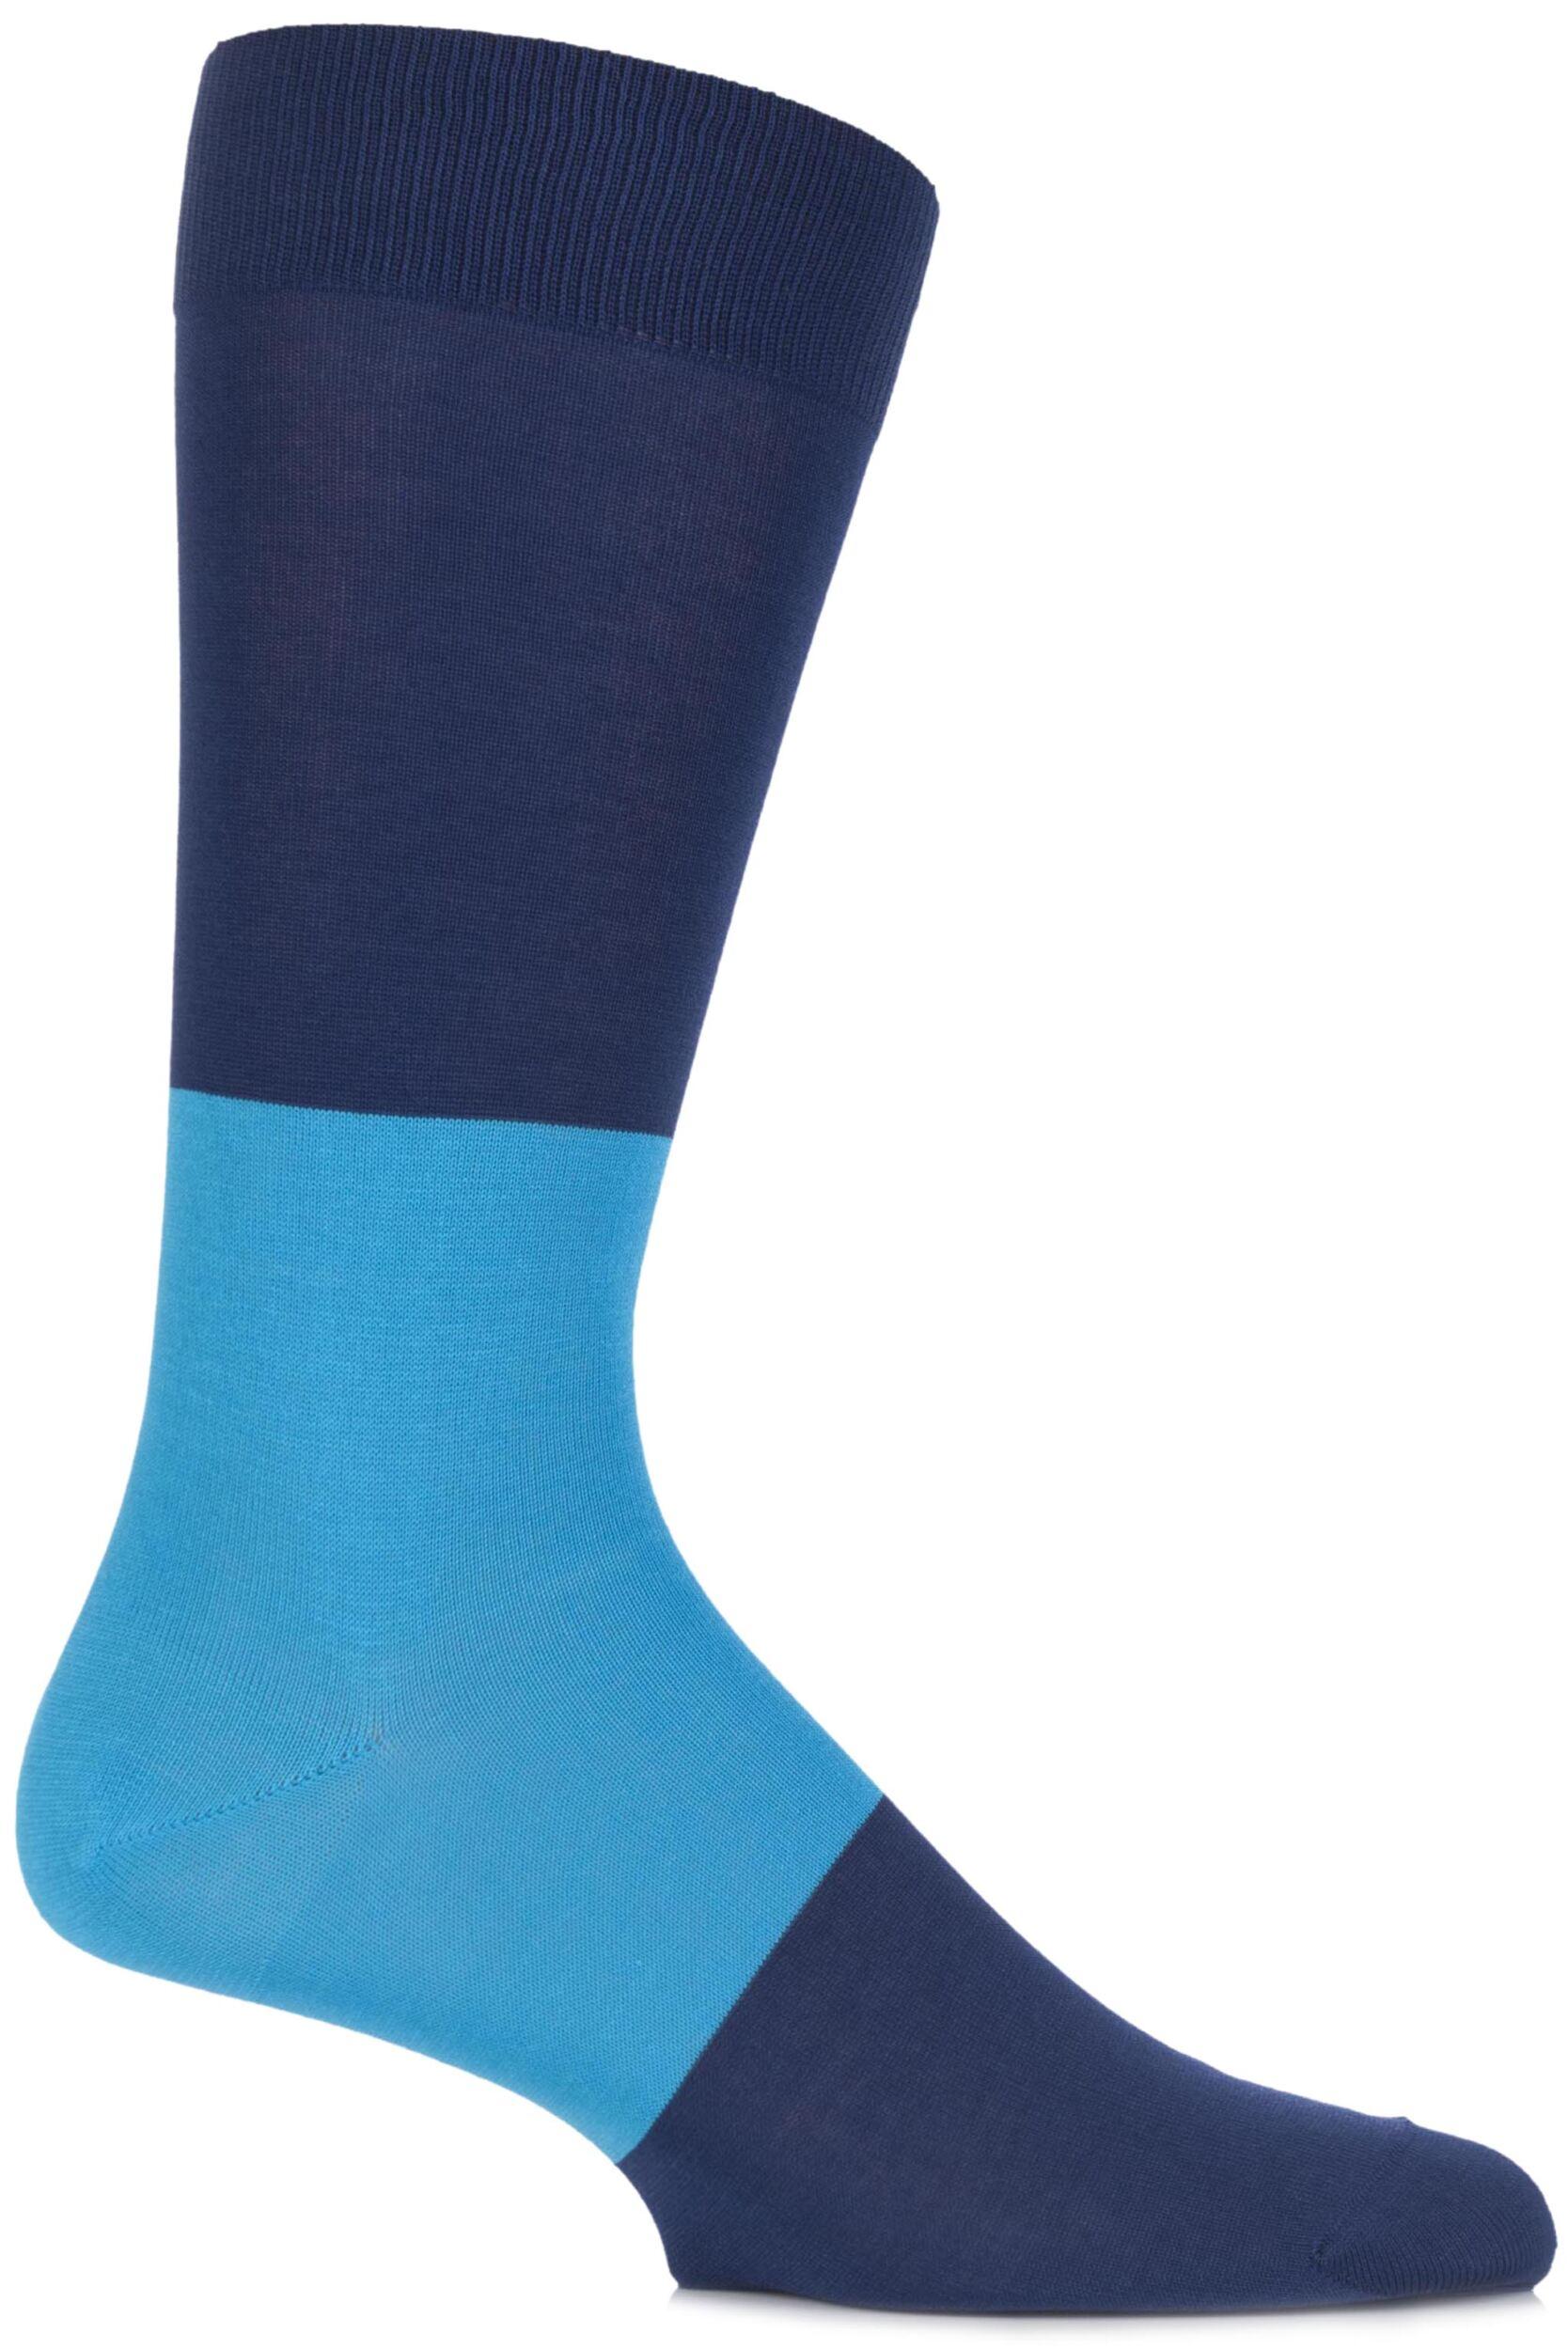 Men's Socks Mens 1 Pair Richard James Sahara Block Striped Cotton Socks